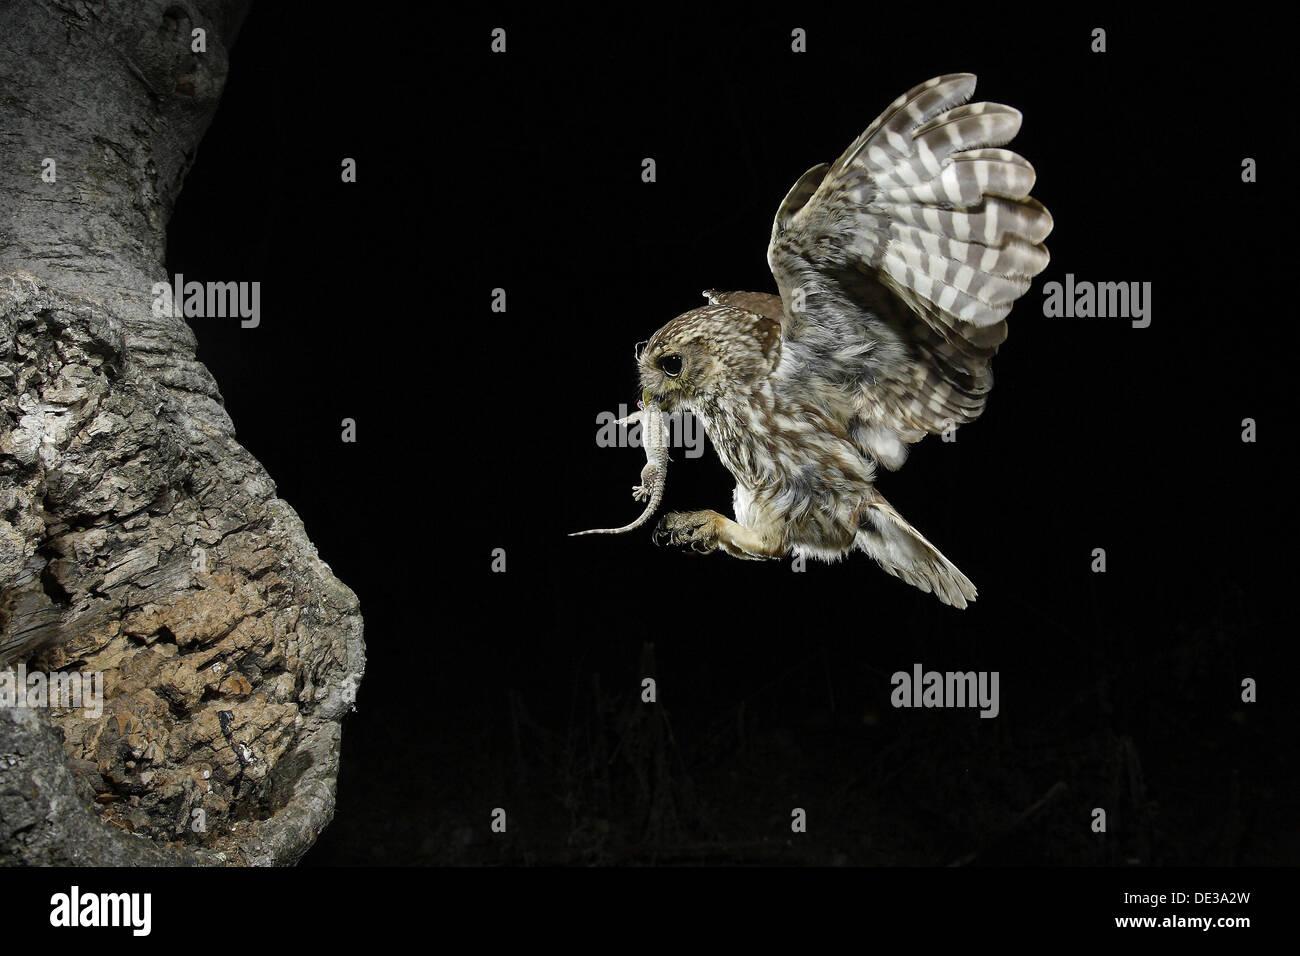 Owl (Athene noctua) - Stock Image